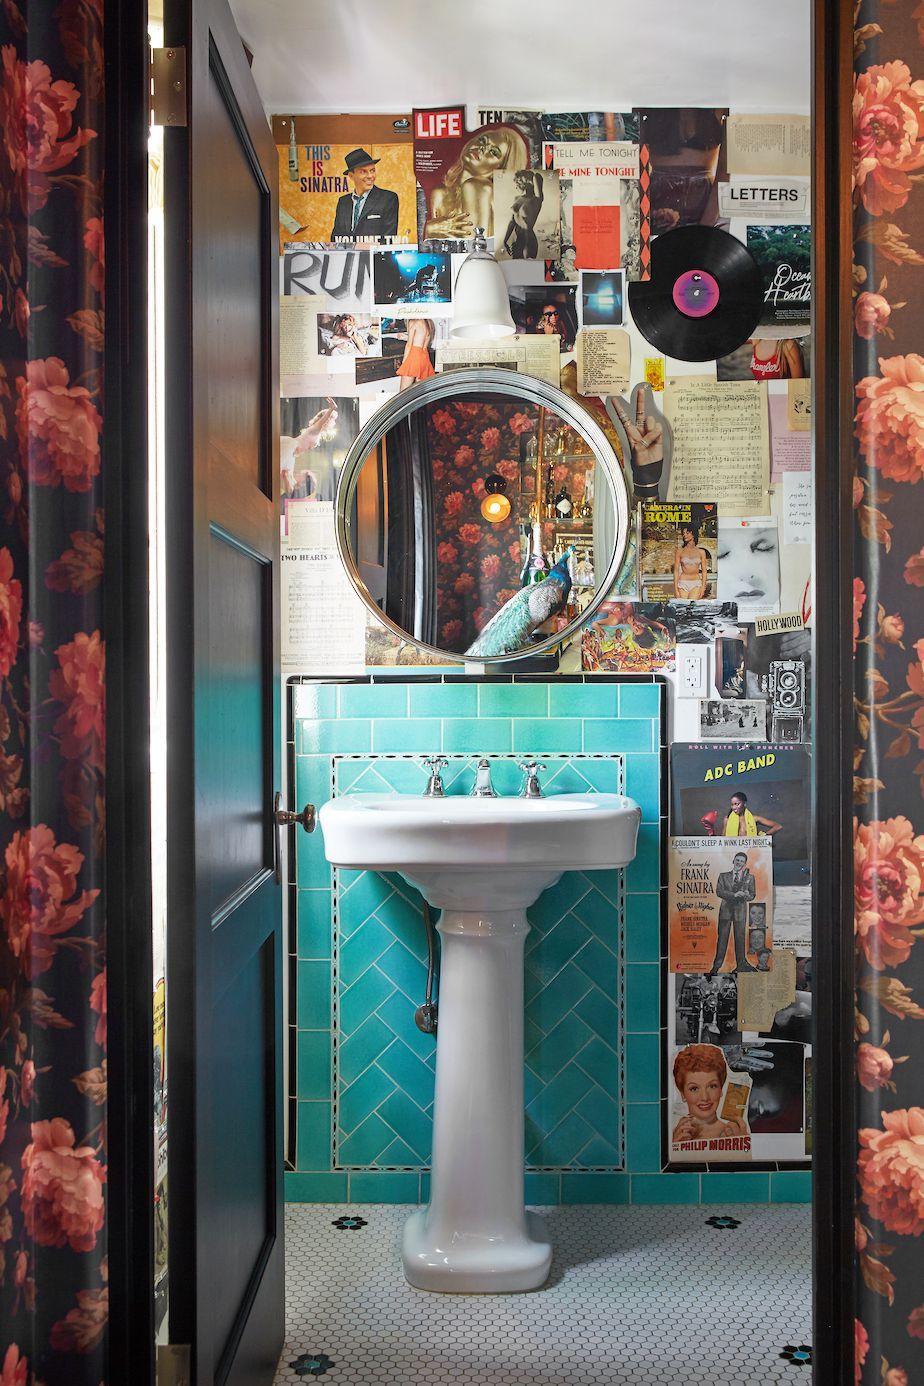 Bathroom Decorating Ideas On A Budget, Ideas For Bathroom Decorating On A Budget